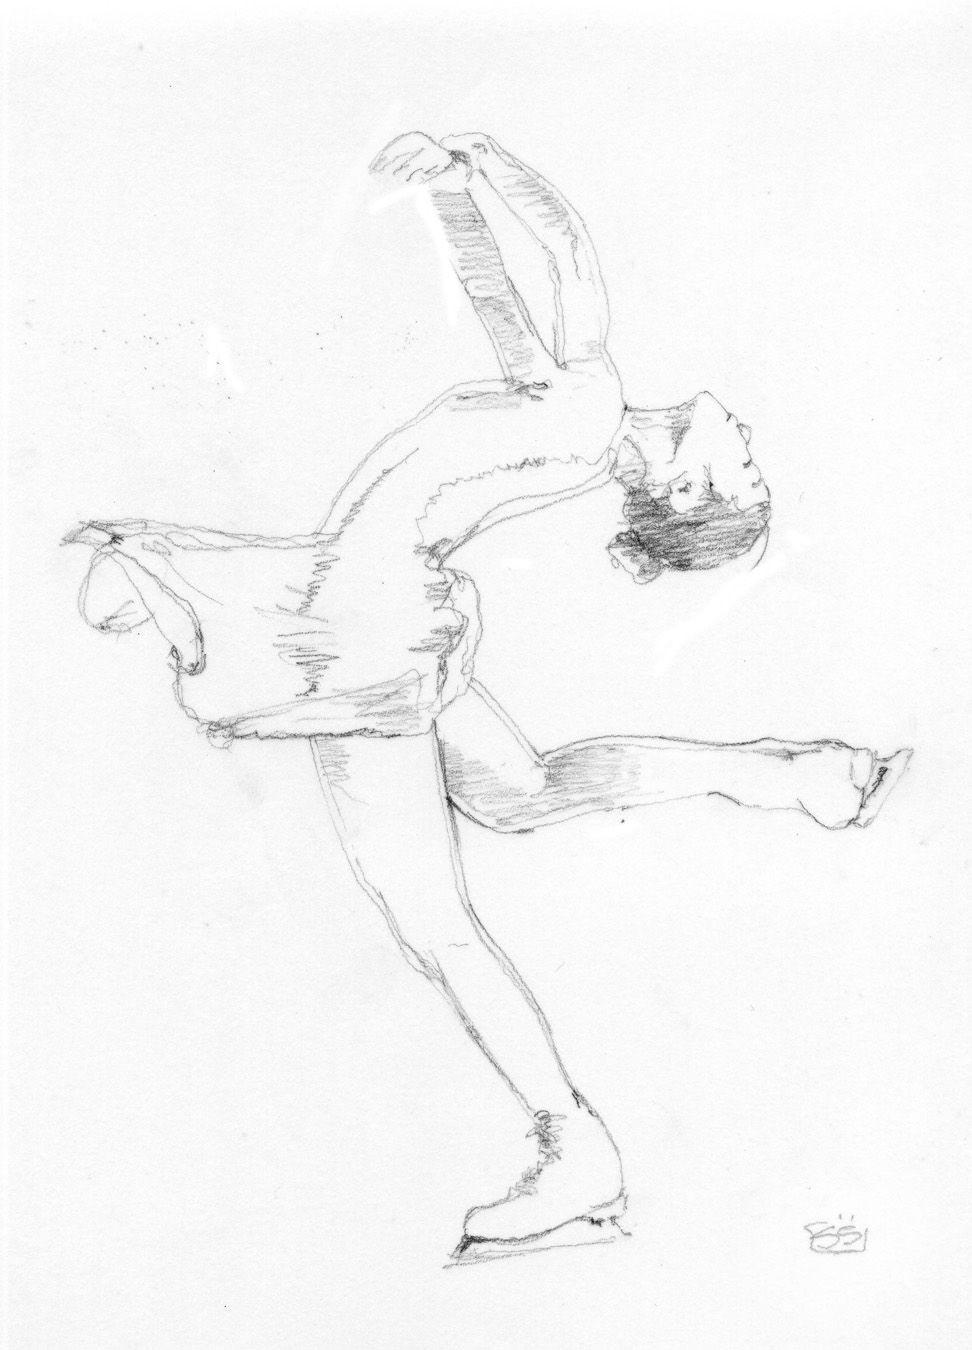 Ice skating poses drawing reference